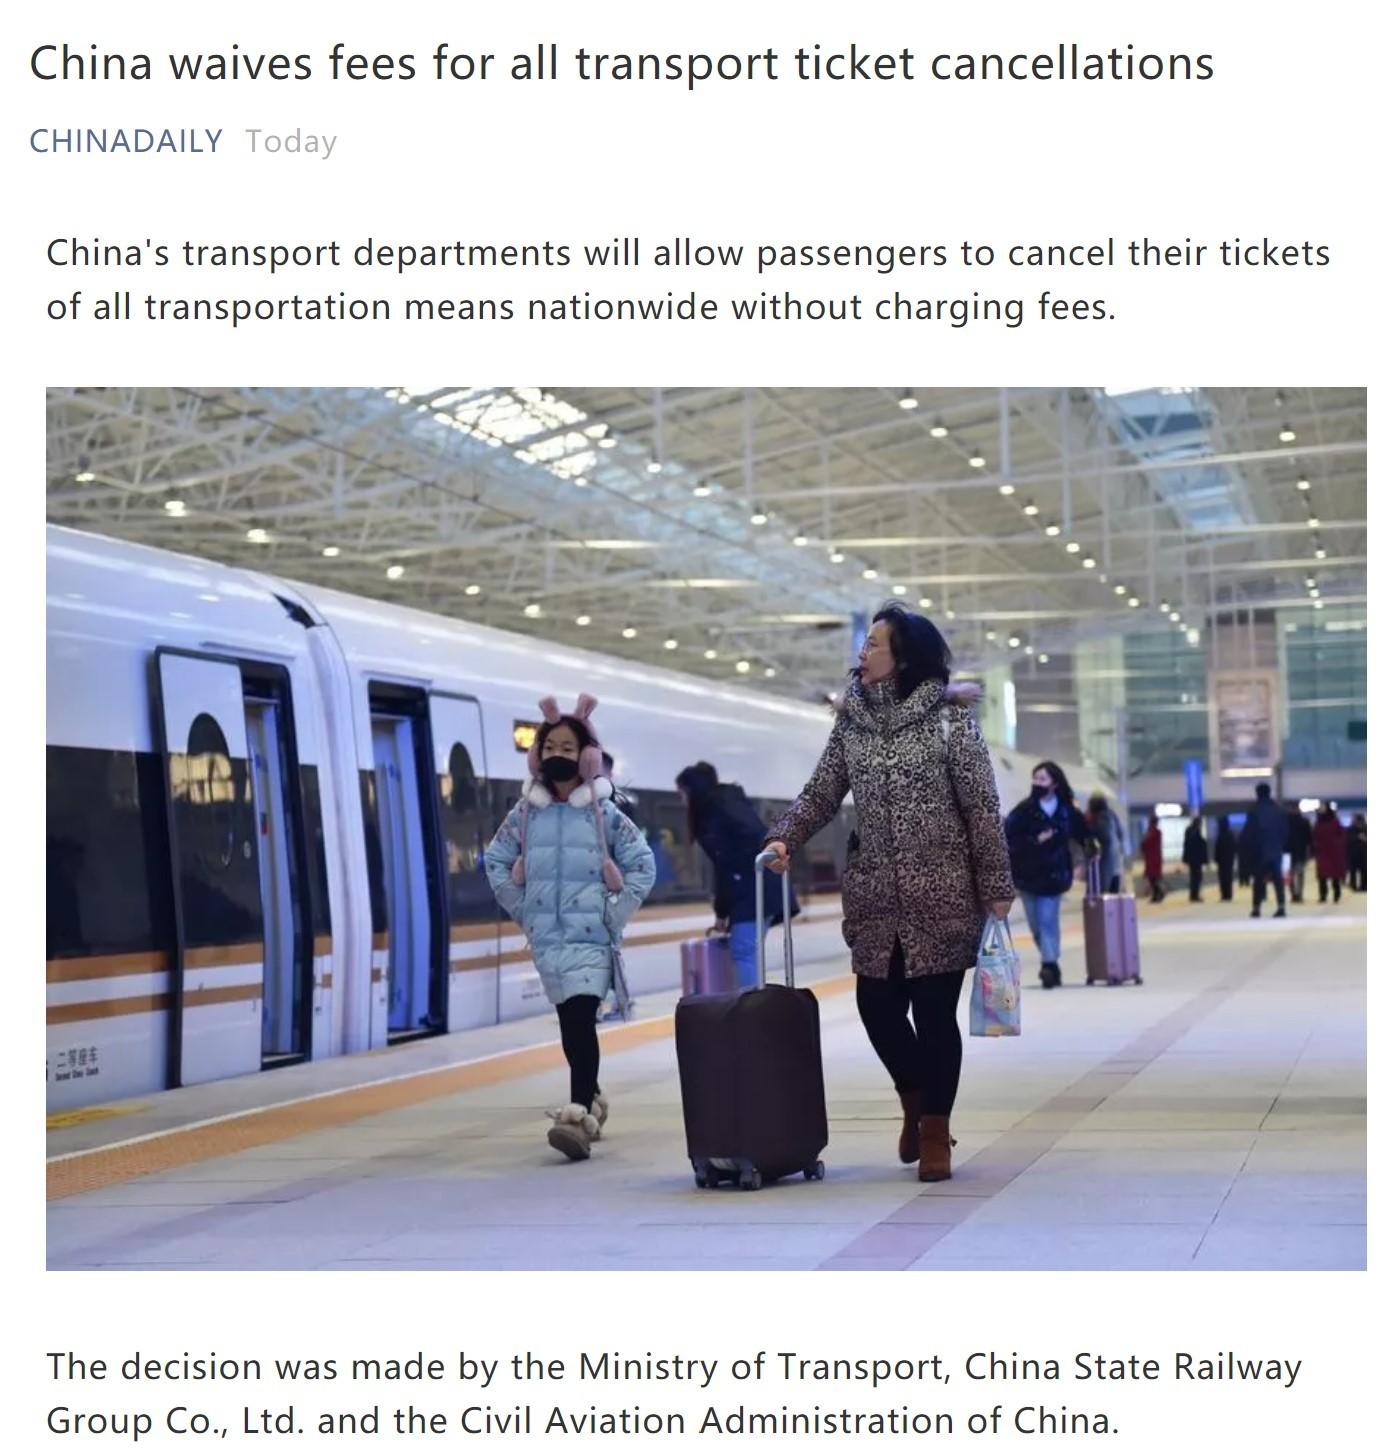 Kementrian Transportasi di China